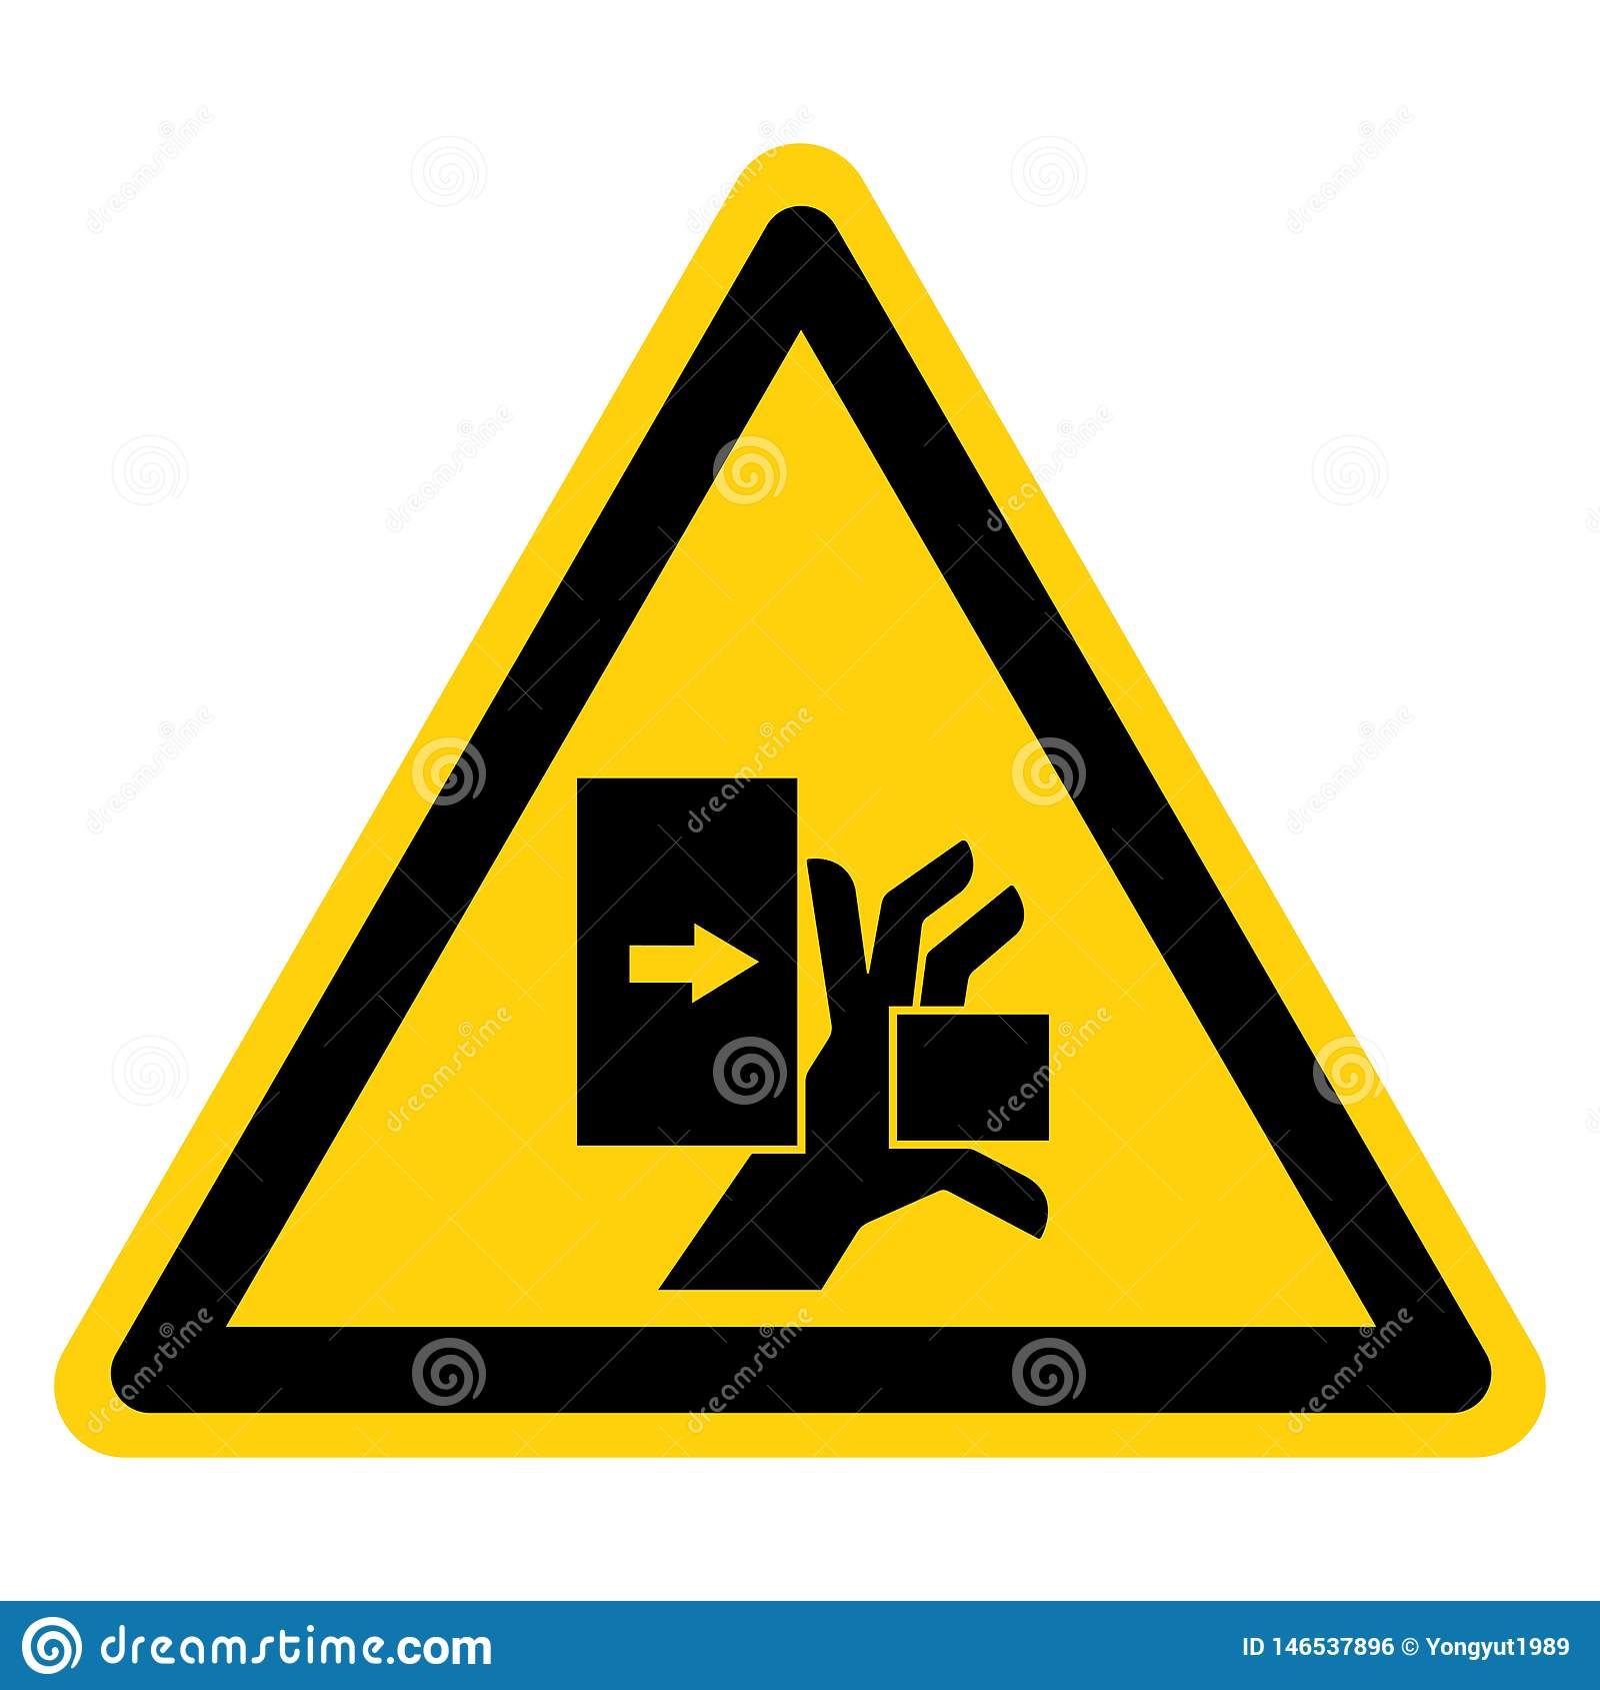 A m?o esmaga a for?a do sinal esquerdo do s?mbolo, ilustra??o do vetor, isolado na etiqueta branca do fundo EPS10